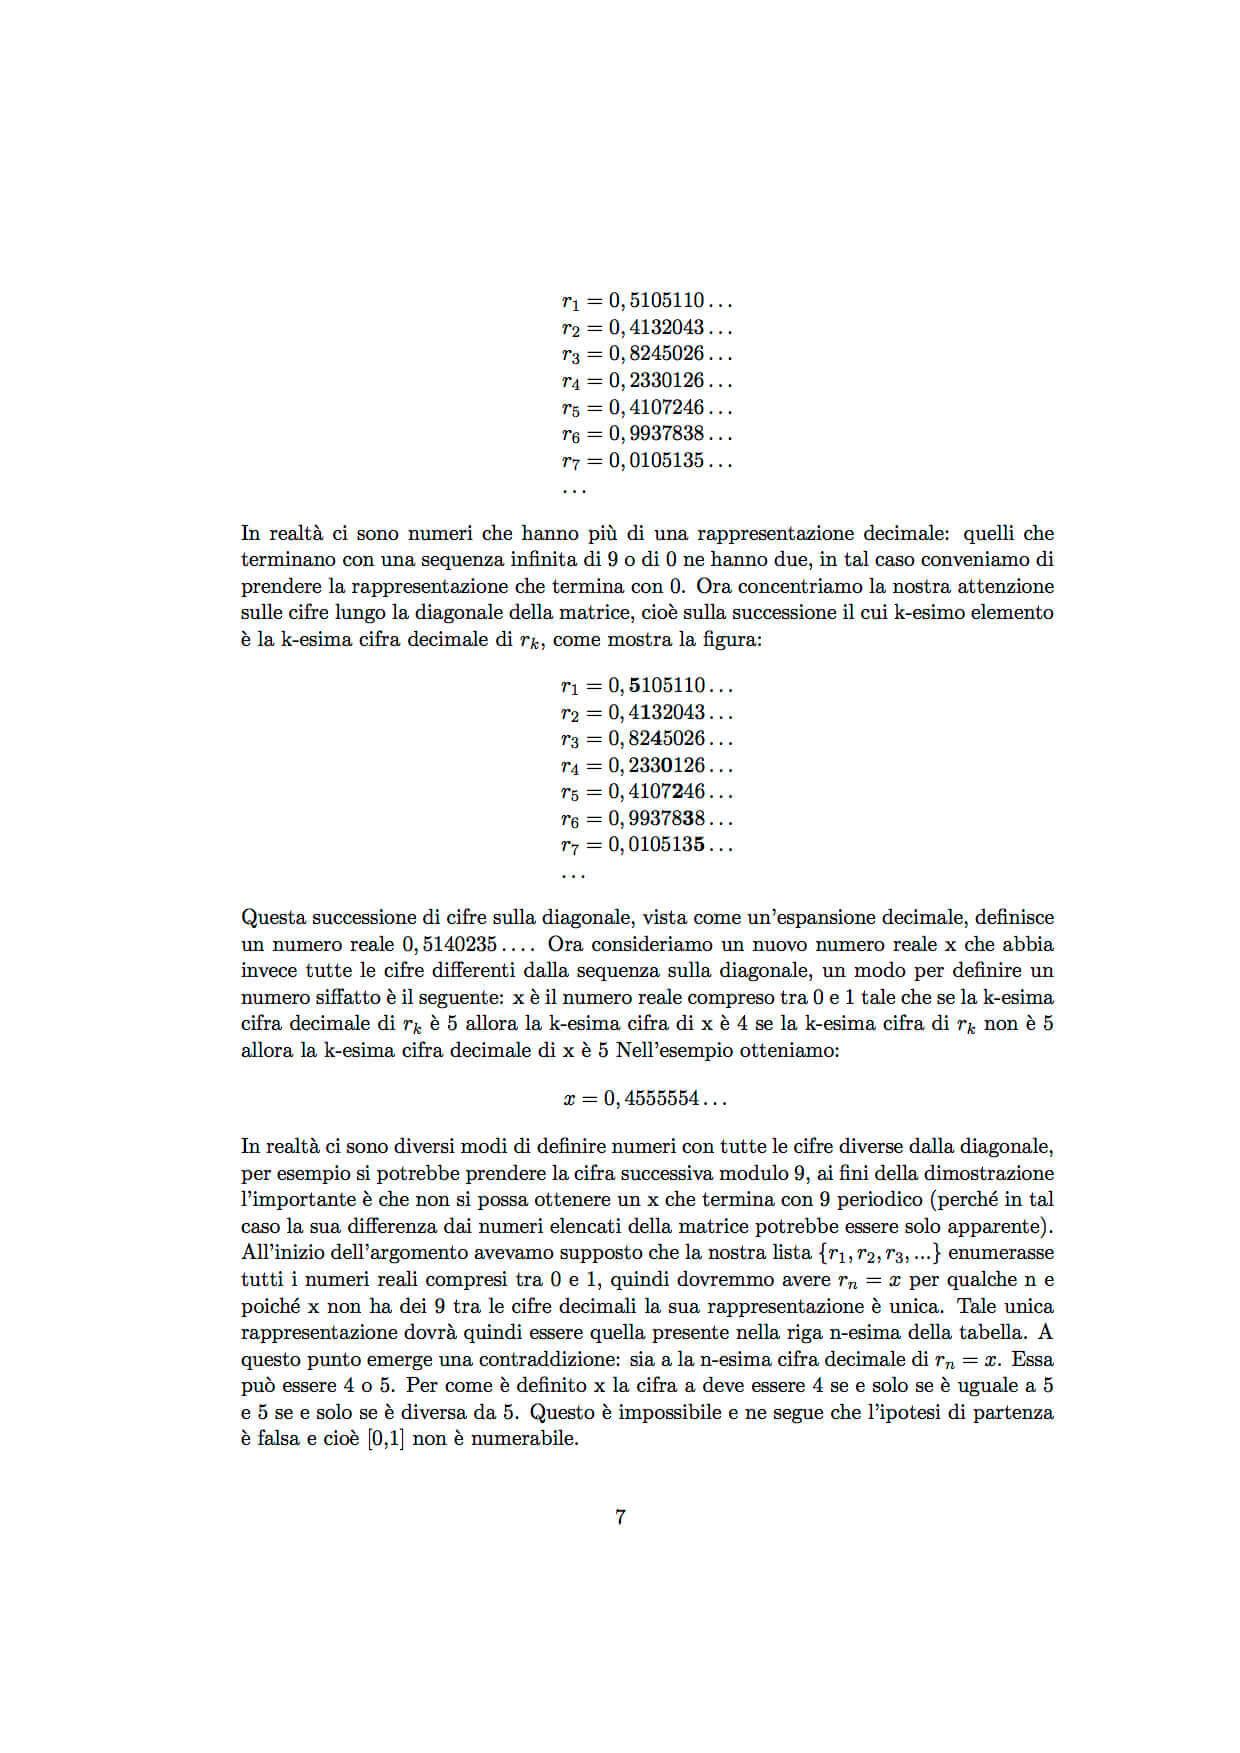 MATEMATICA MATURITA' 2014/ Soluzioni problemi e quesiti ...